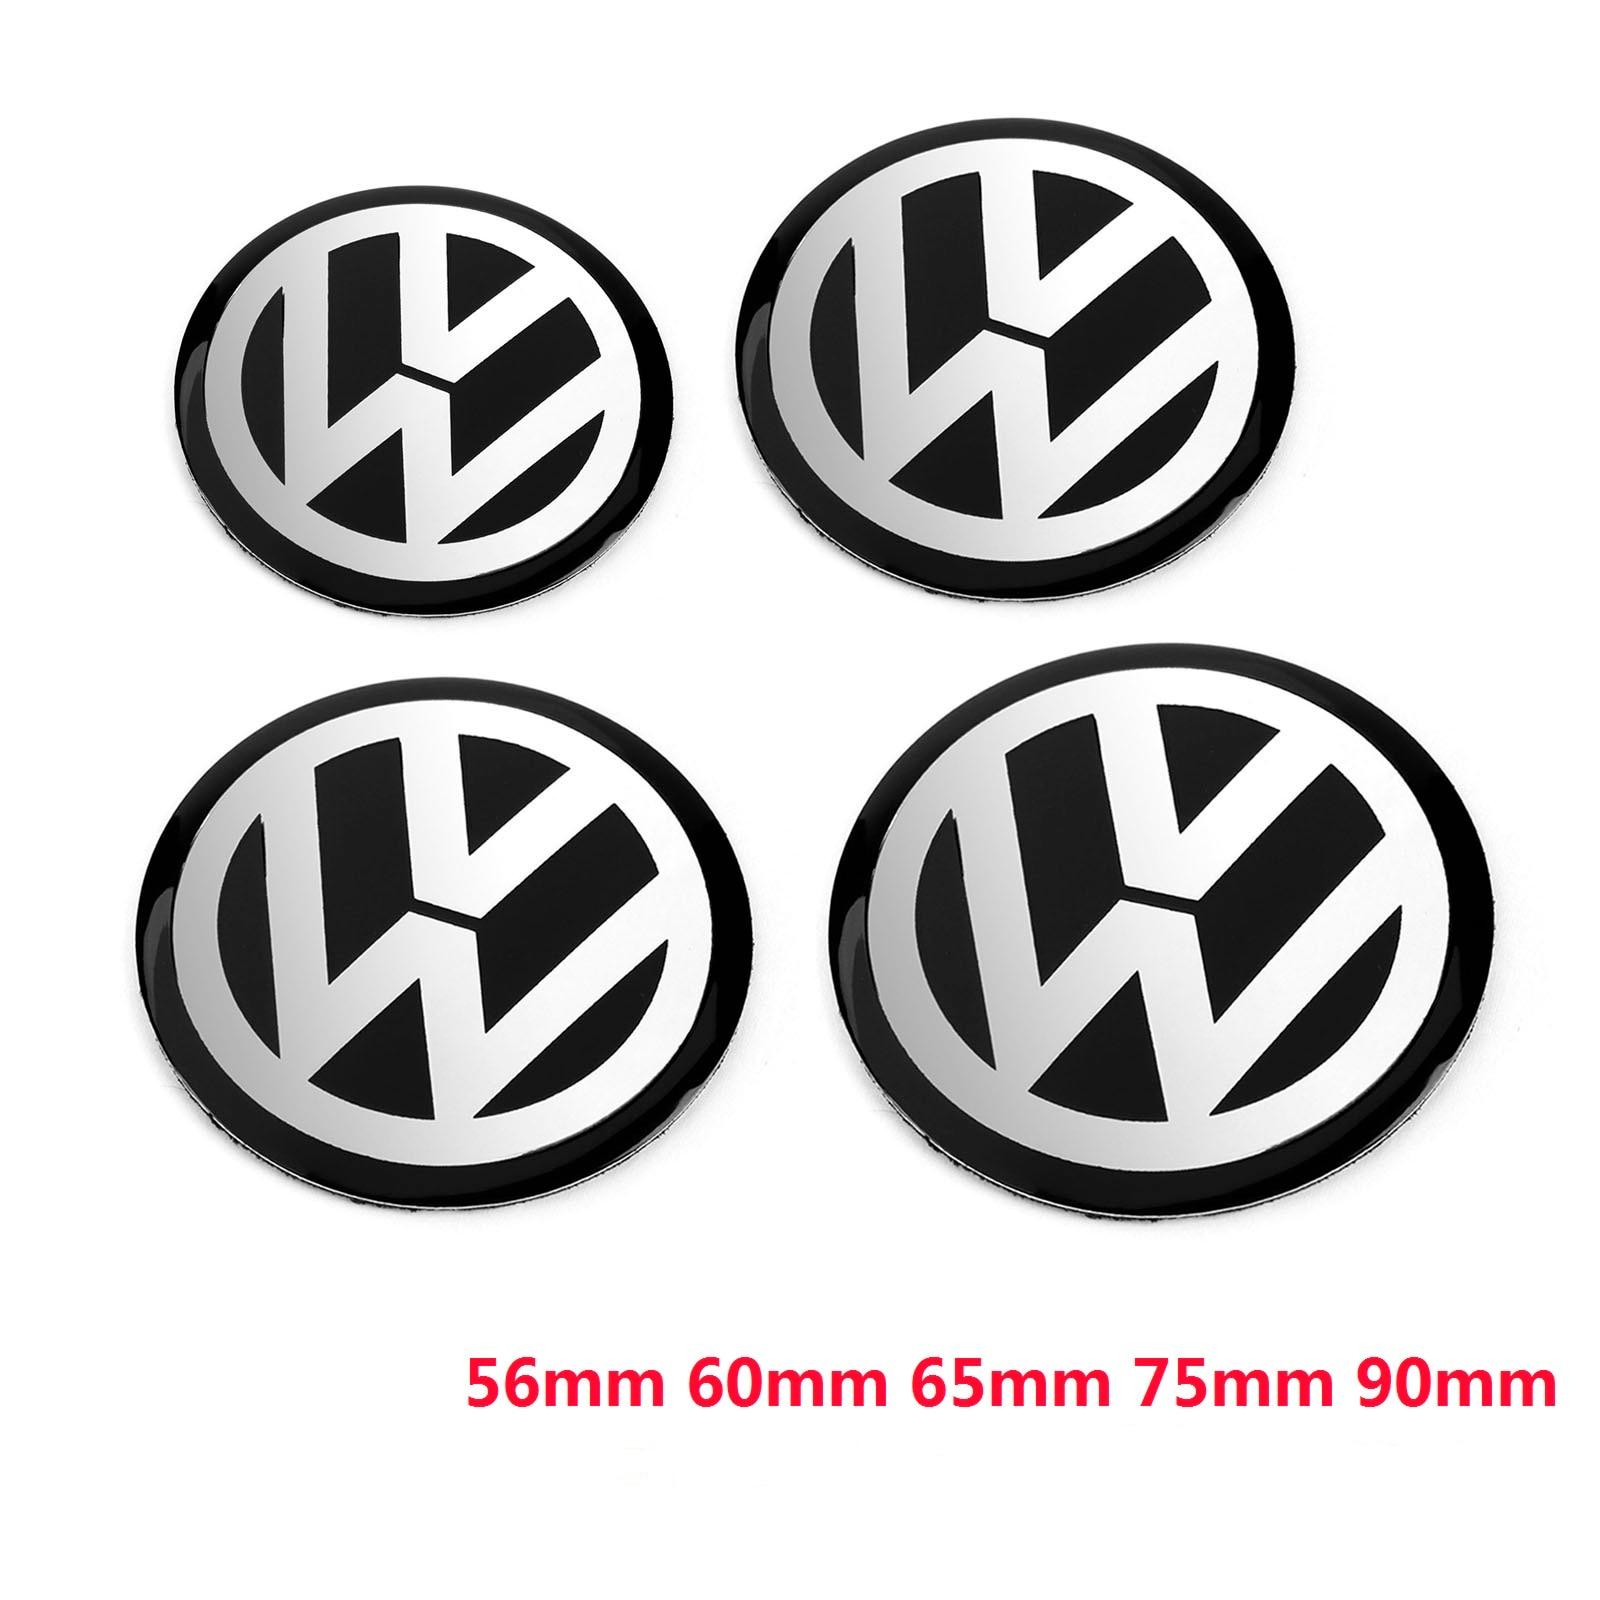 4 Pcs 56 Mm 60 Mm 65 Mm 75 Mm 90 Mm Hitam Mobil Roda Pusat Hub Cap Lencana Logo emblem Decal Roda Sticker Styling untuk VW title=